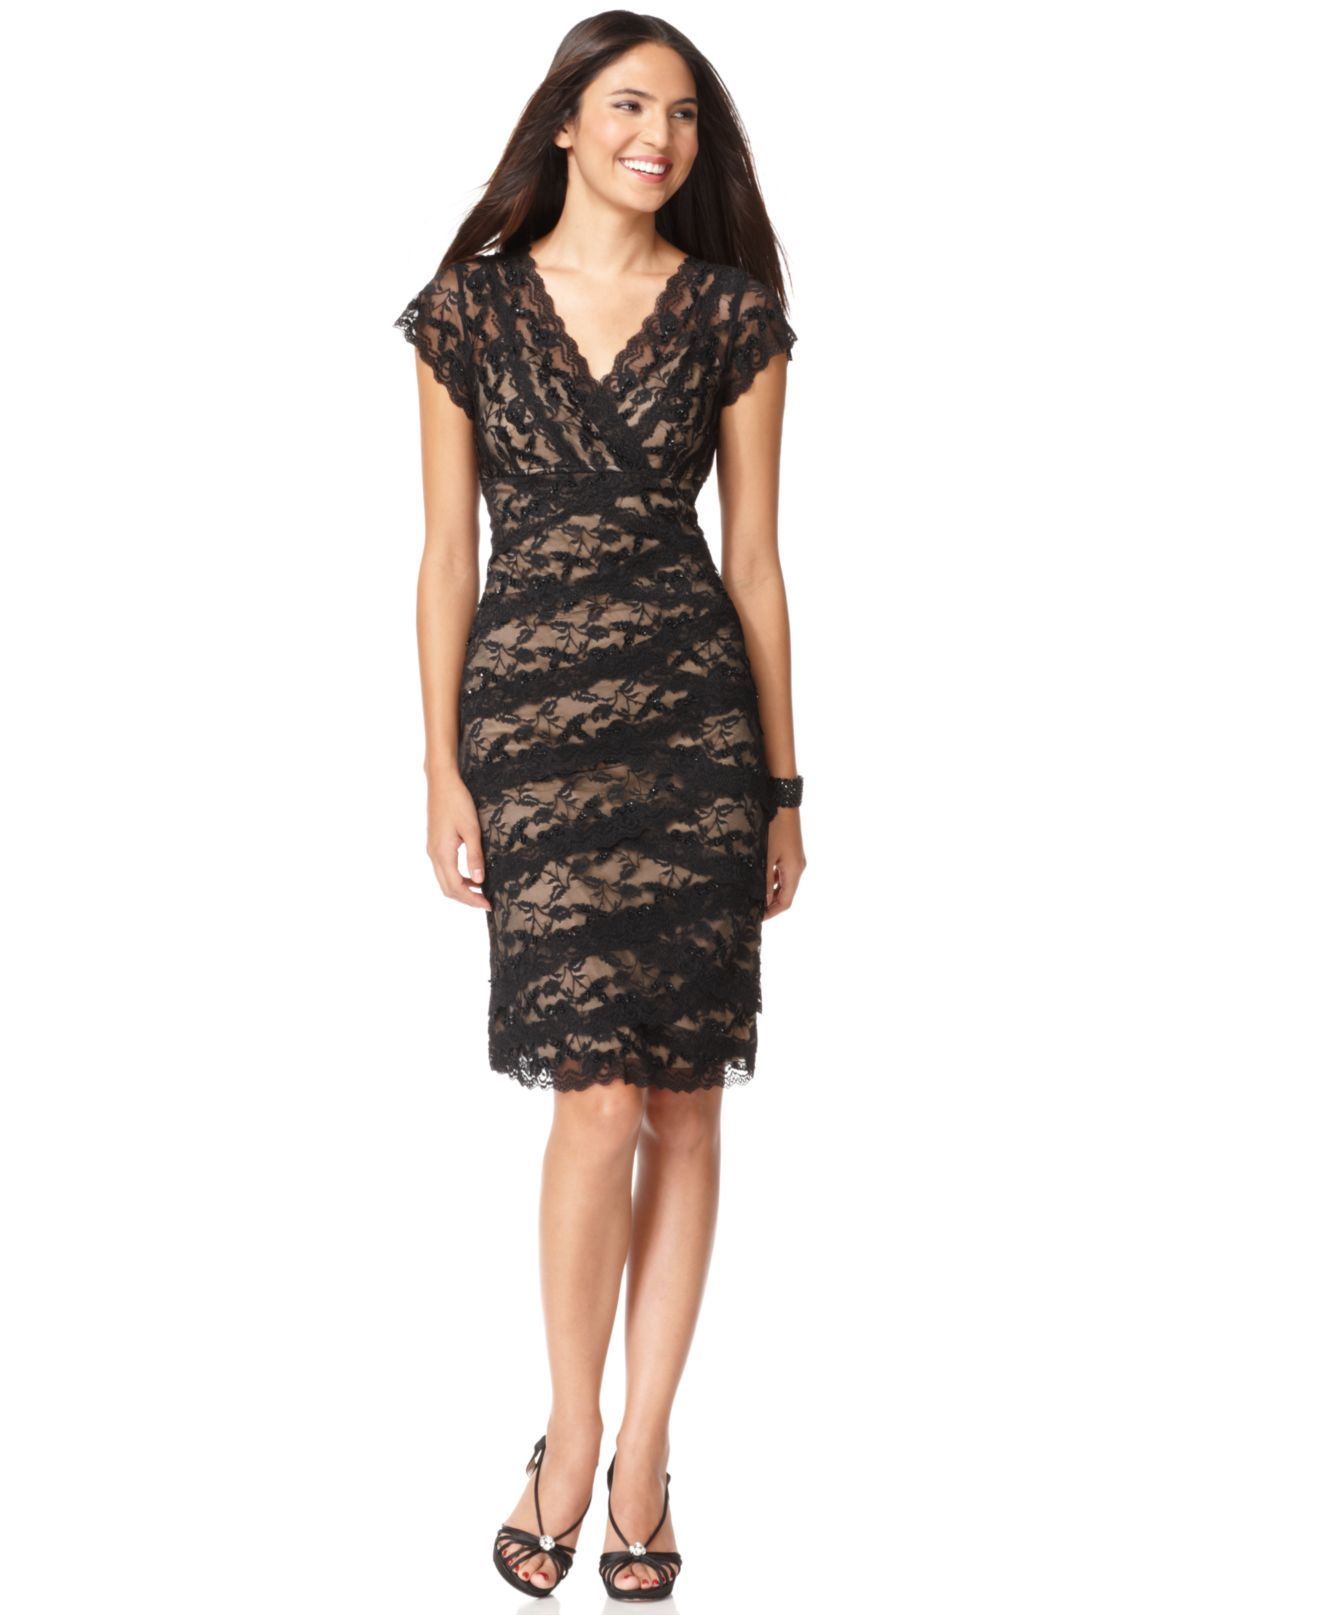 Need This Dress For A Wedding Marina Dress Macys